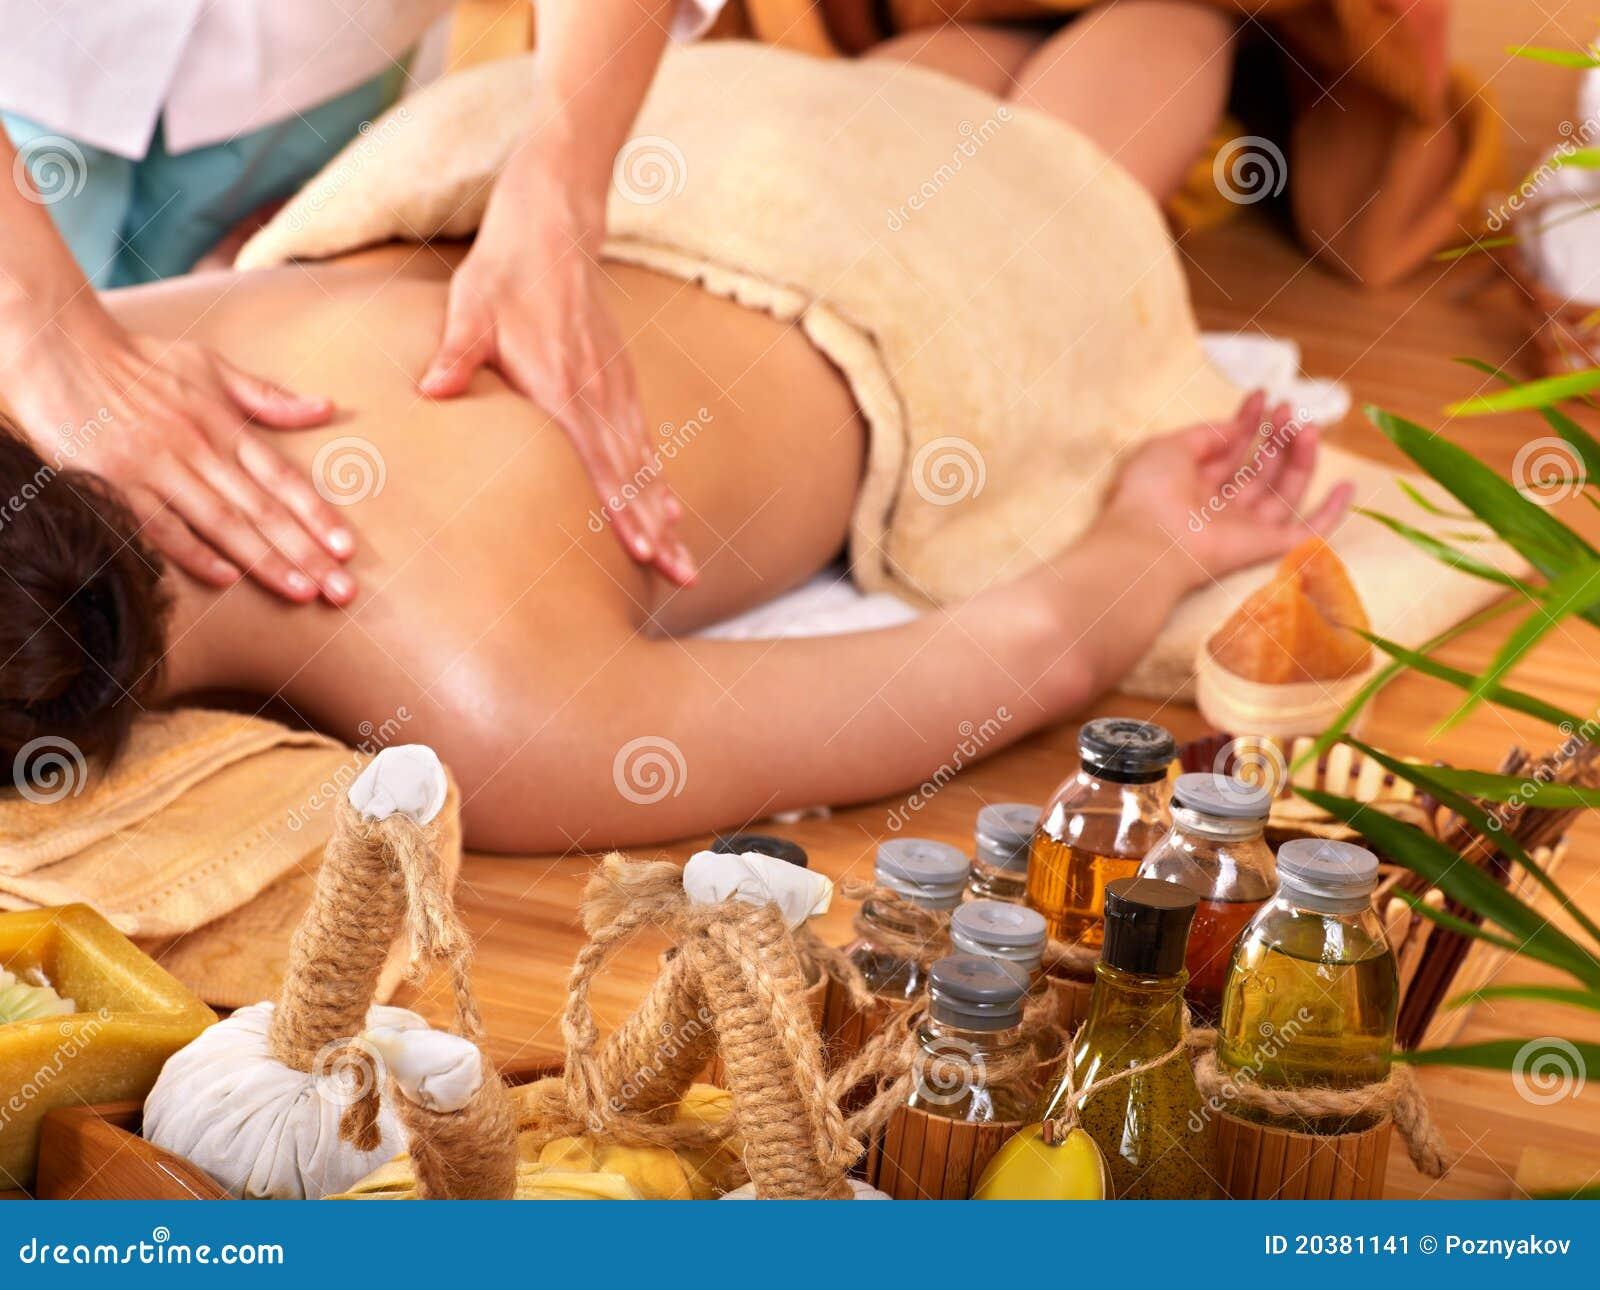 bamboo thai massage girl on girl massage